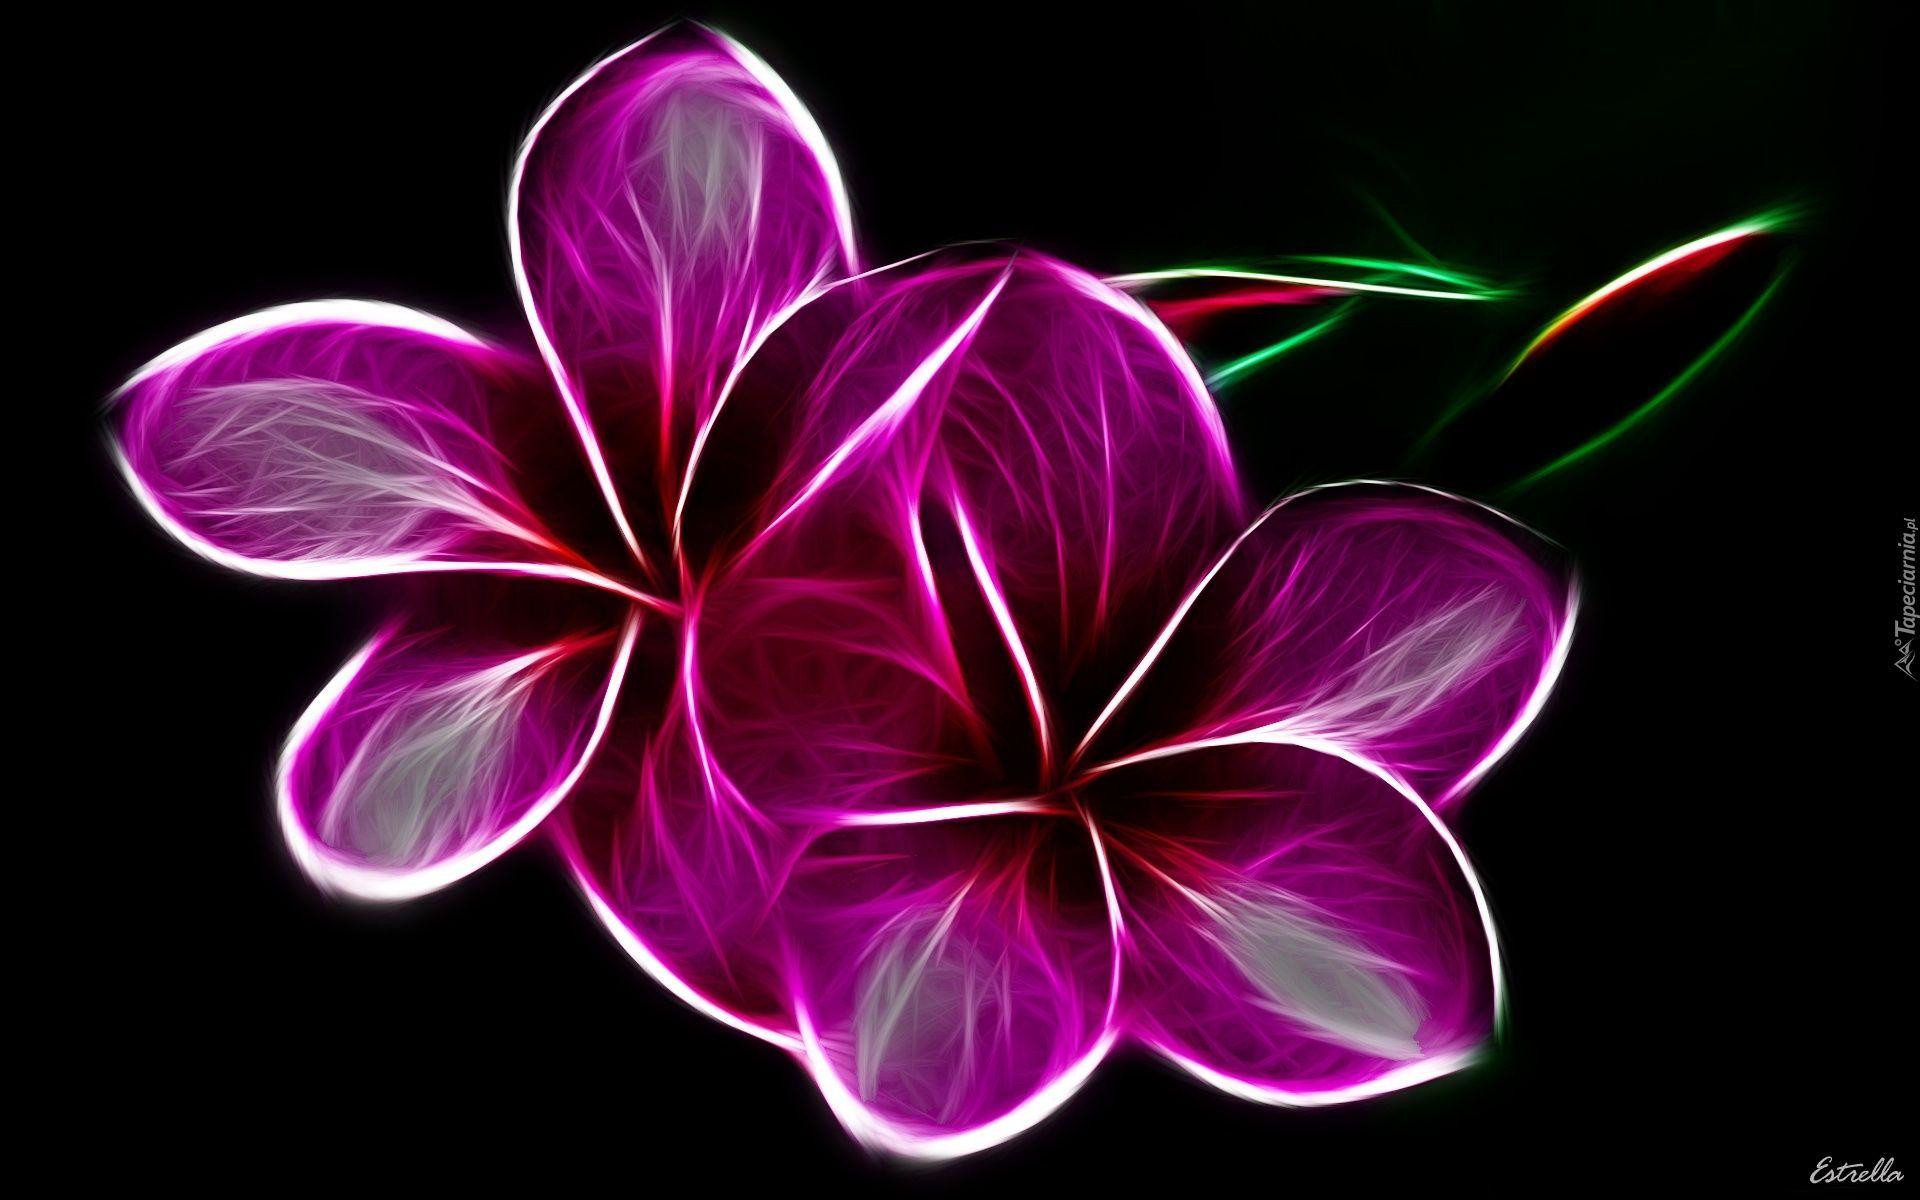 Pin By Beti0x On Tapety Grafika Komputerowa Tapeciarnia Pl Purple Flowers Flower Art Flower Images